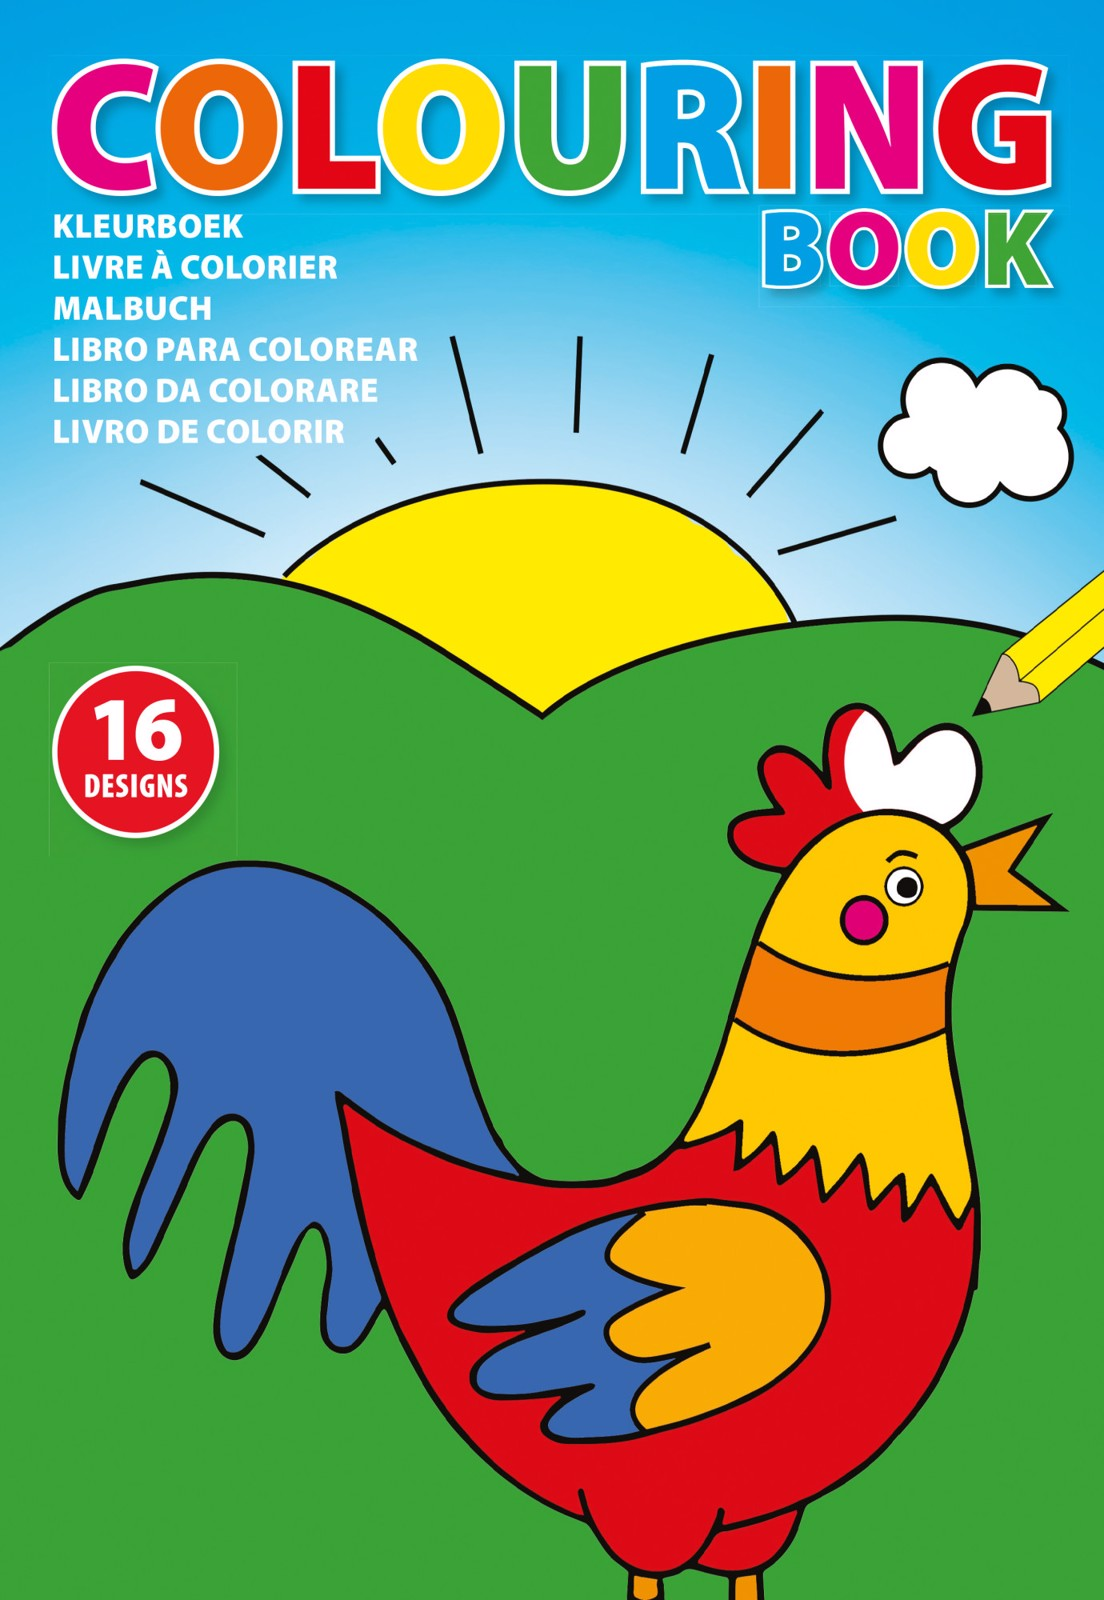 Cardboard colouring book